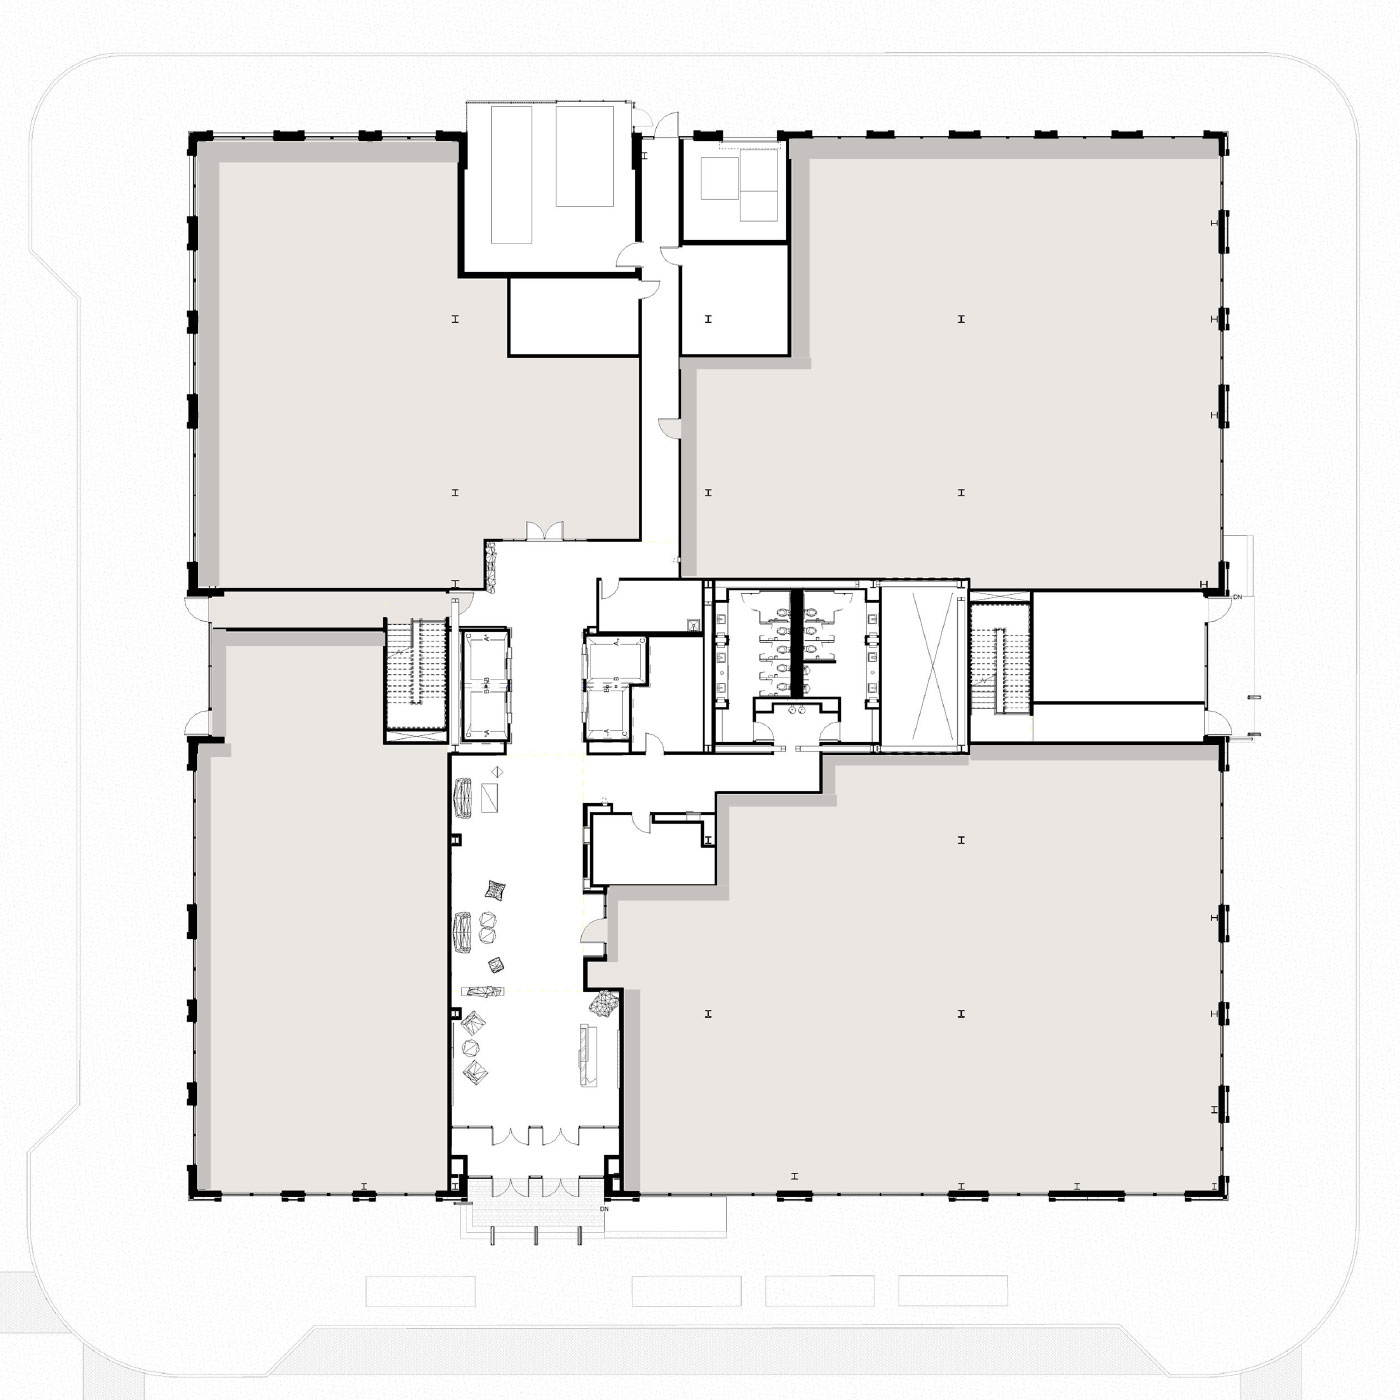 Peninsula Floor Plan Level 1